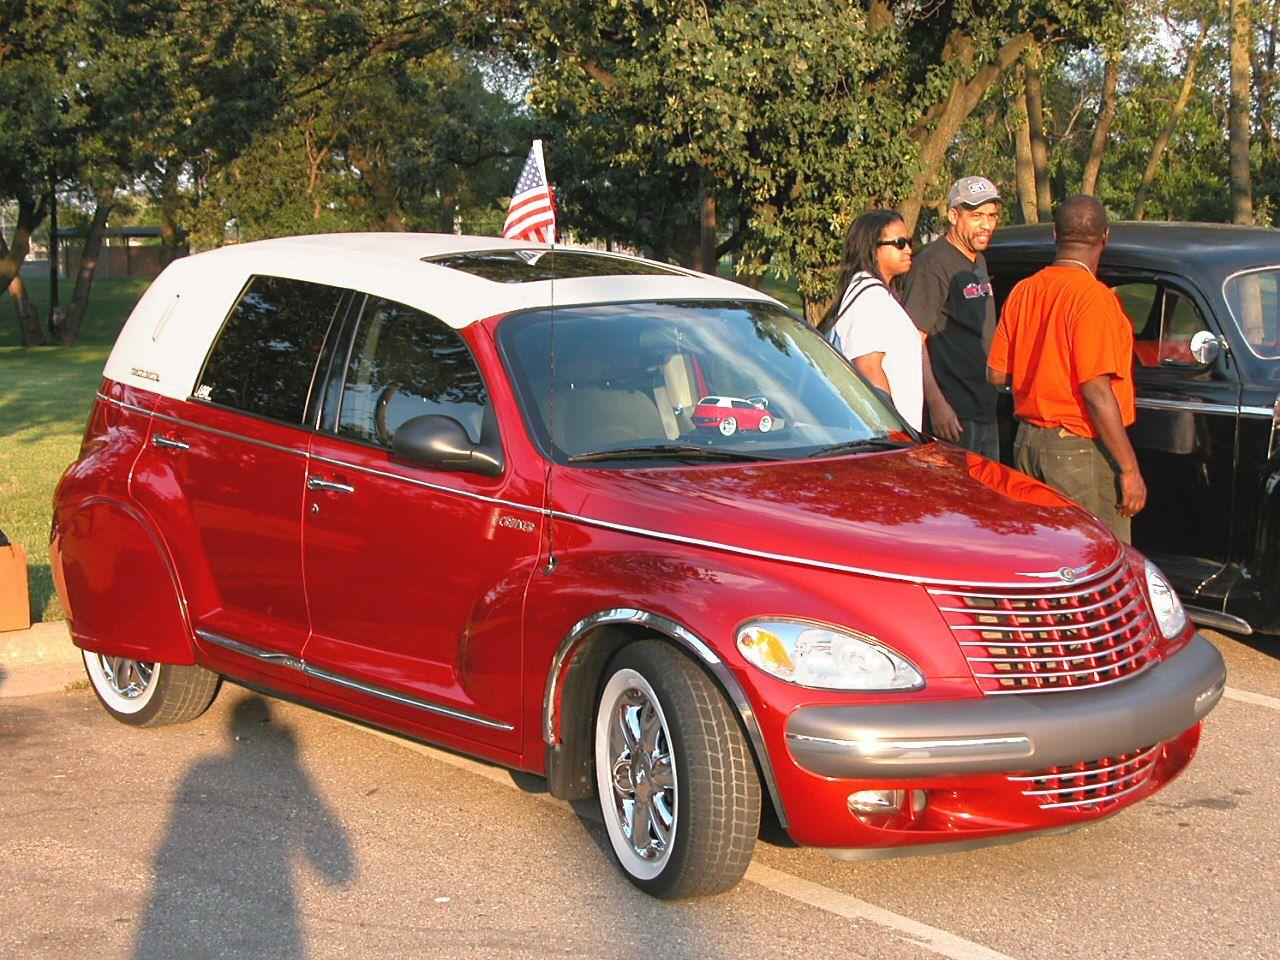 Custom car cars 2002 chrysler pt cruiser custom car convertible wsw tires fender